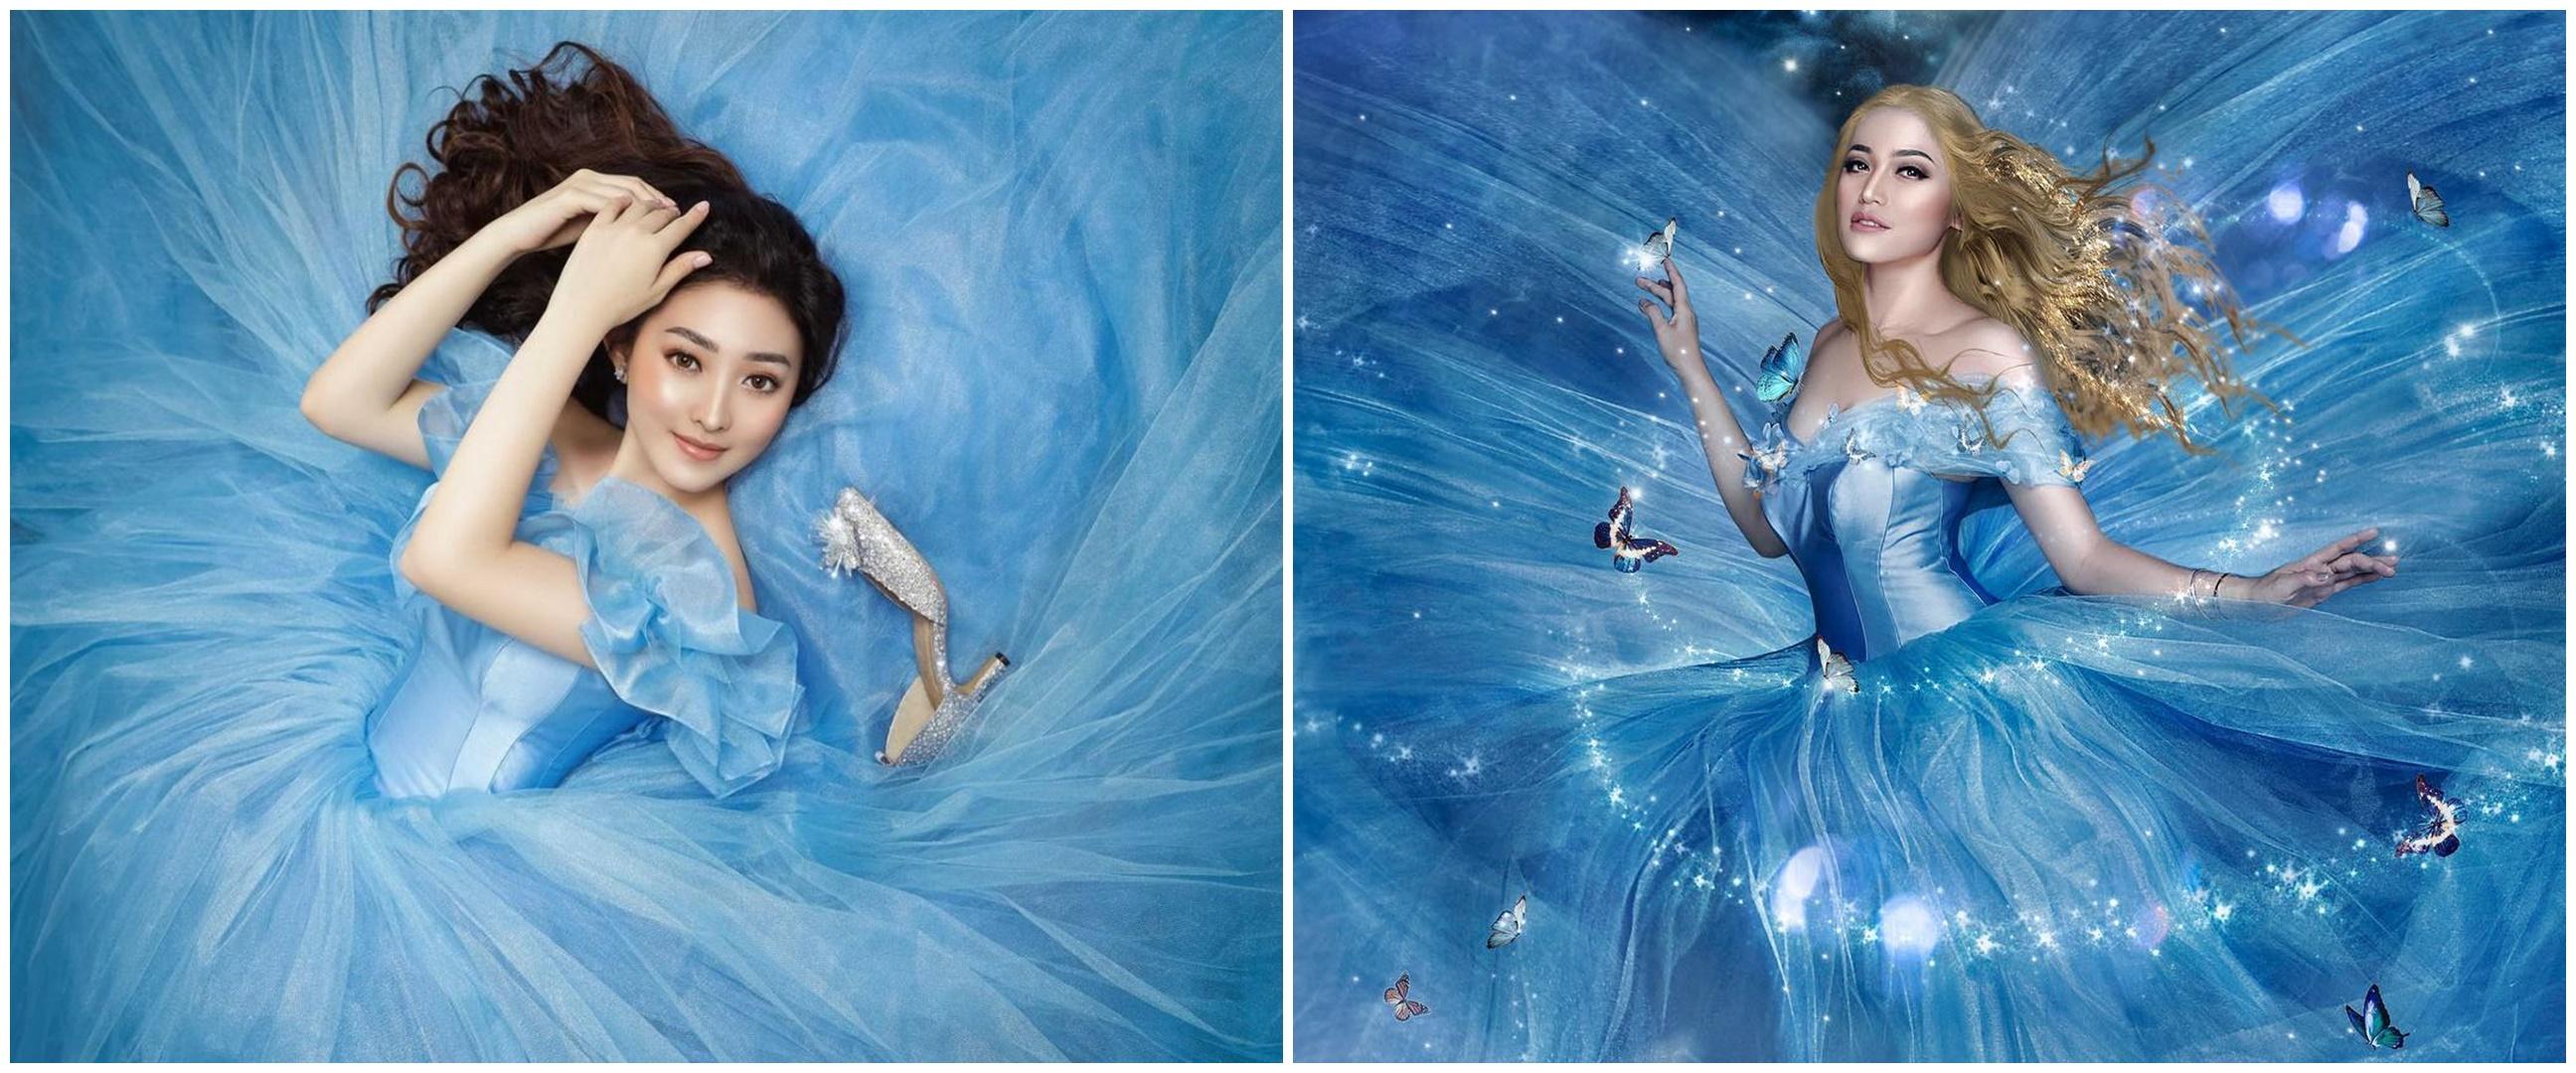 Beda penampilan 6 seleb dandan ala Cinderella, pesonanya terpancar